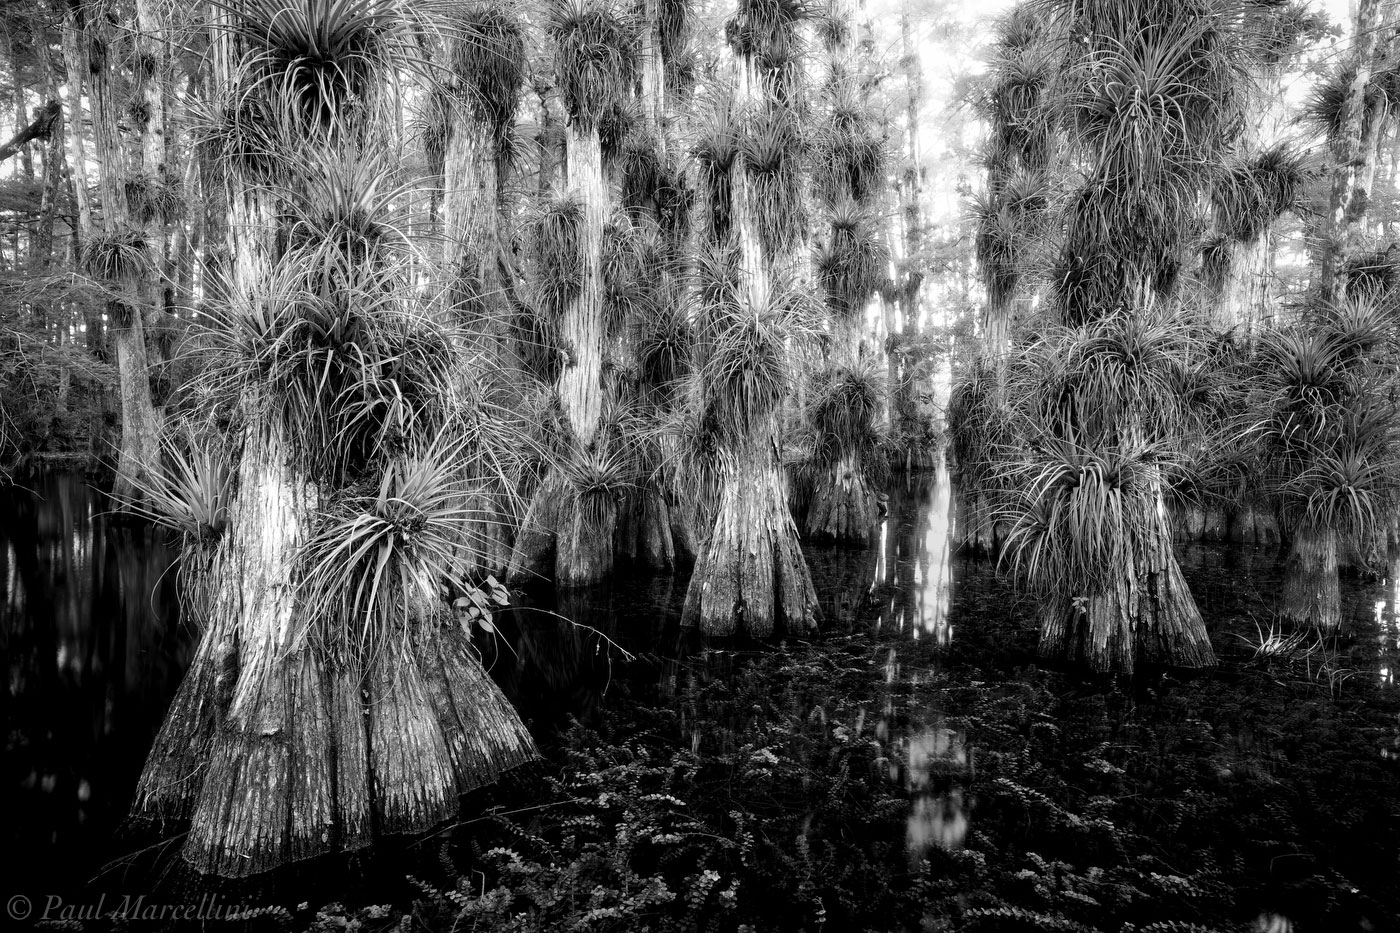 big cypress, bromeliad, swamp, Florida, nature, photography, photo